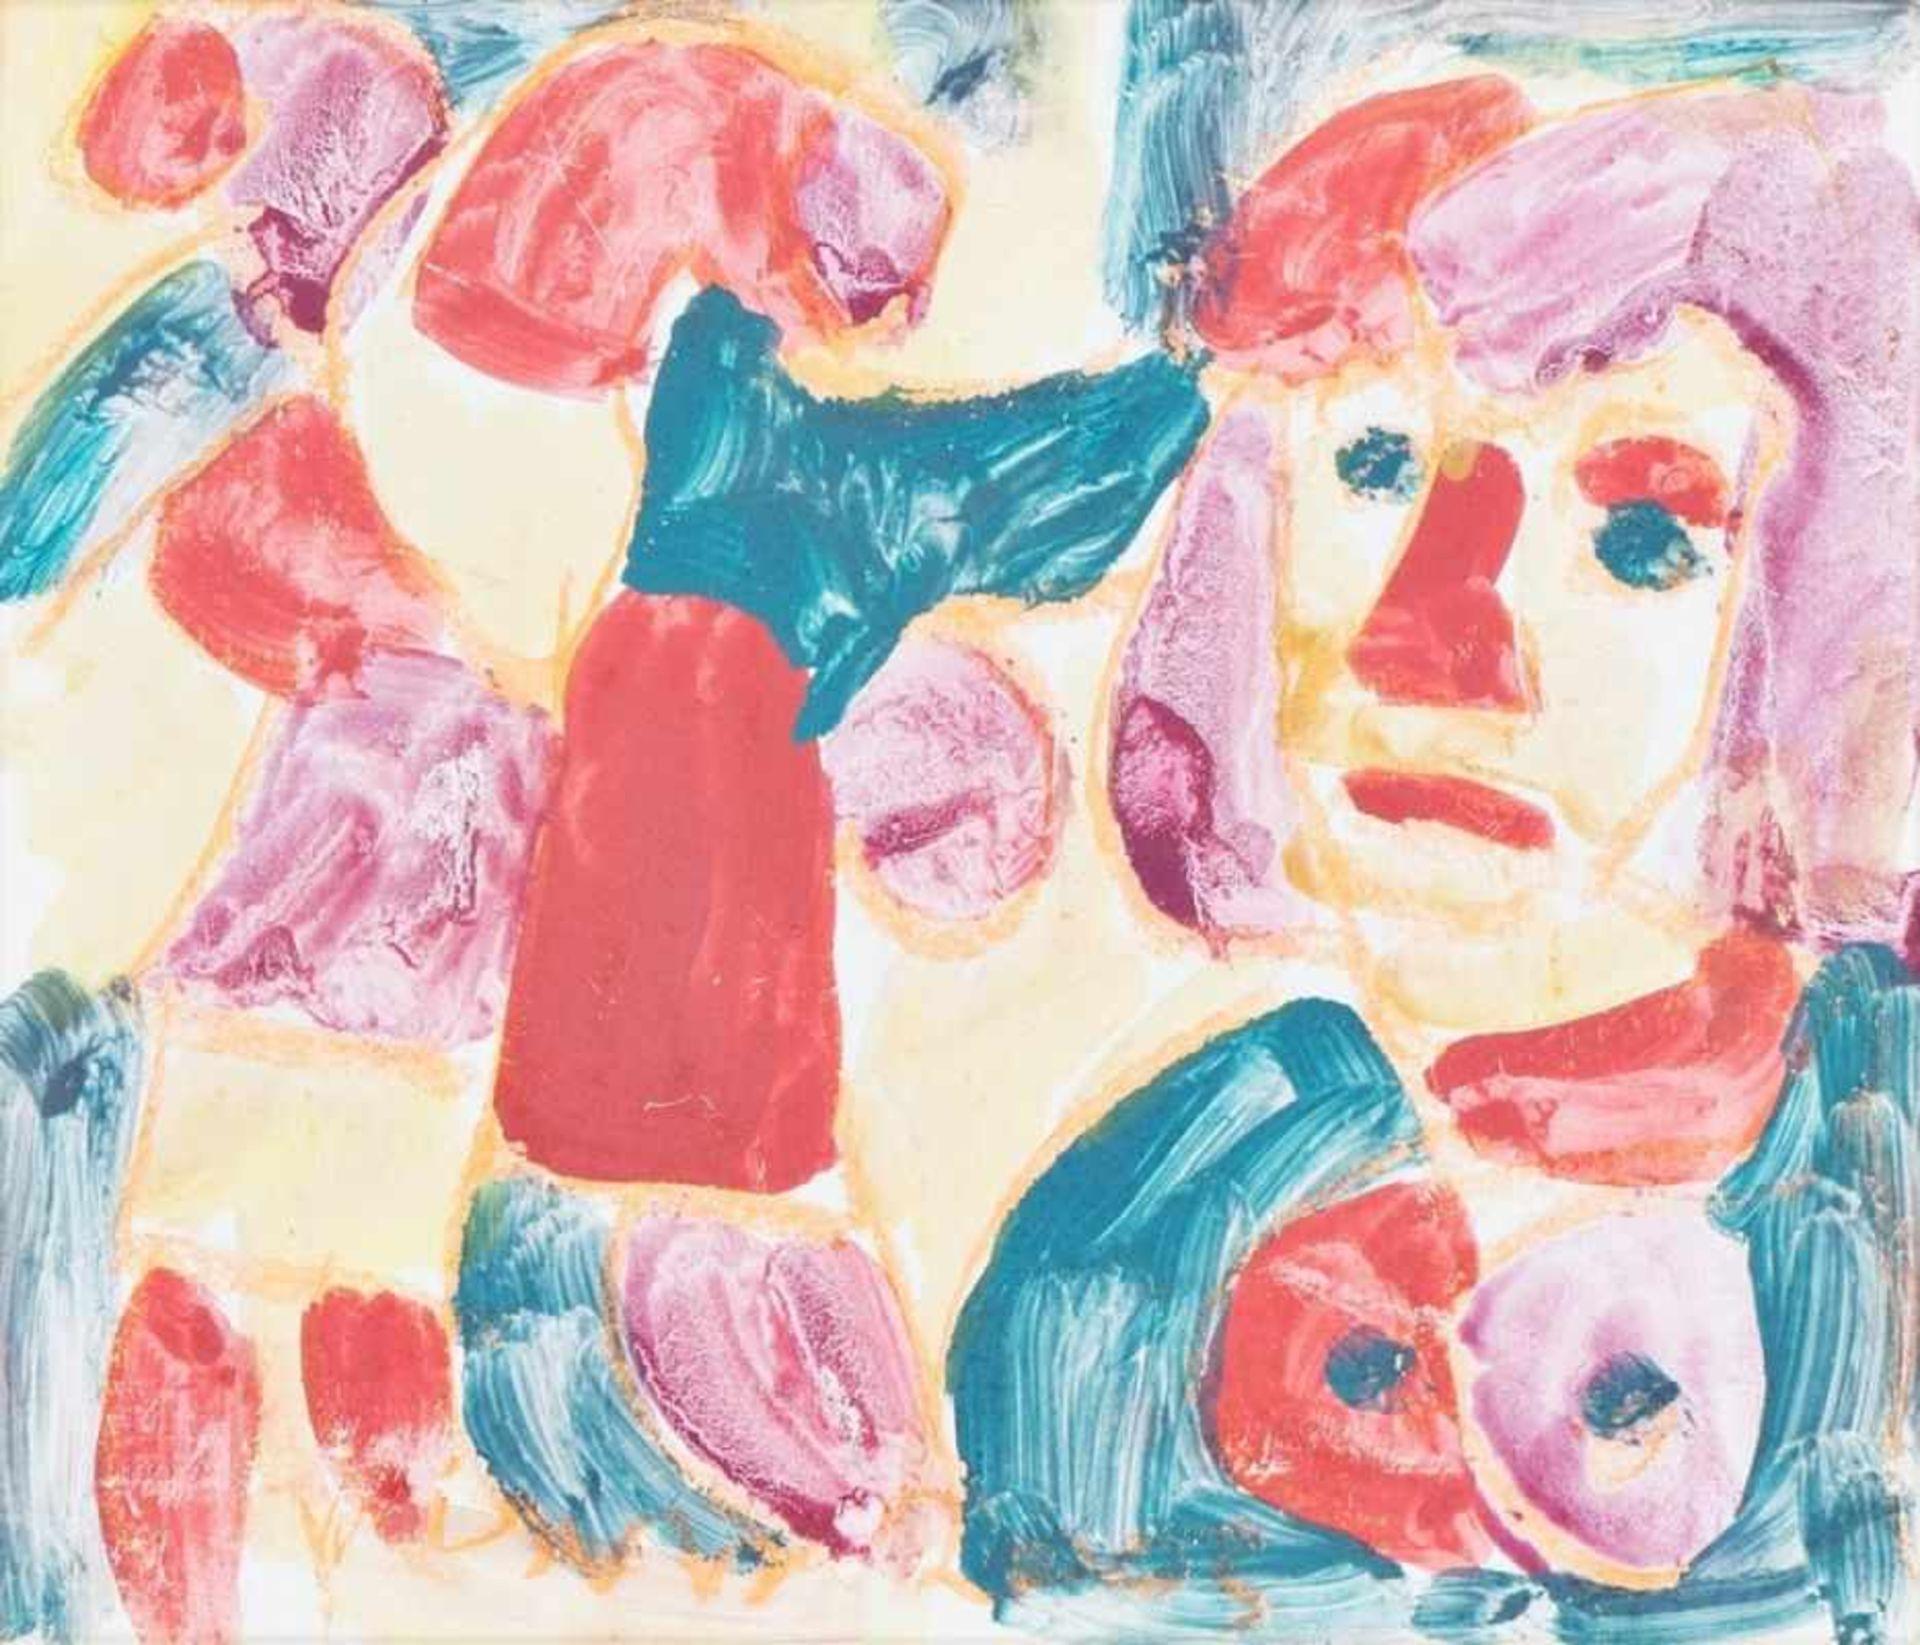 Los 46 - MIKLOS NEMETH(1934 BUDAPEST - 2012 BUDAPEST)o. T.Gouache auf Karton, 29,5 x 34,5 cm,Passepartout,